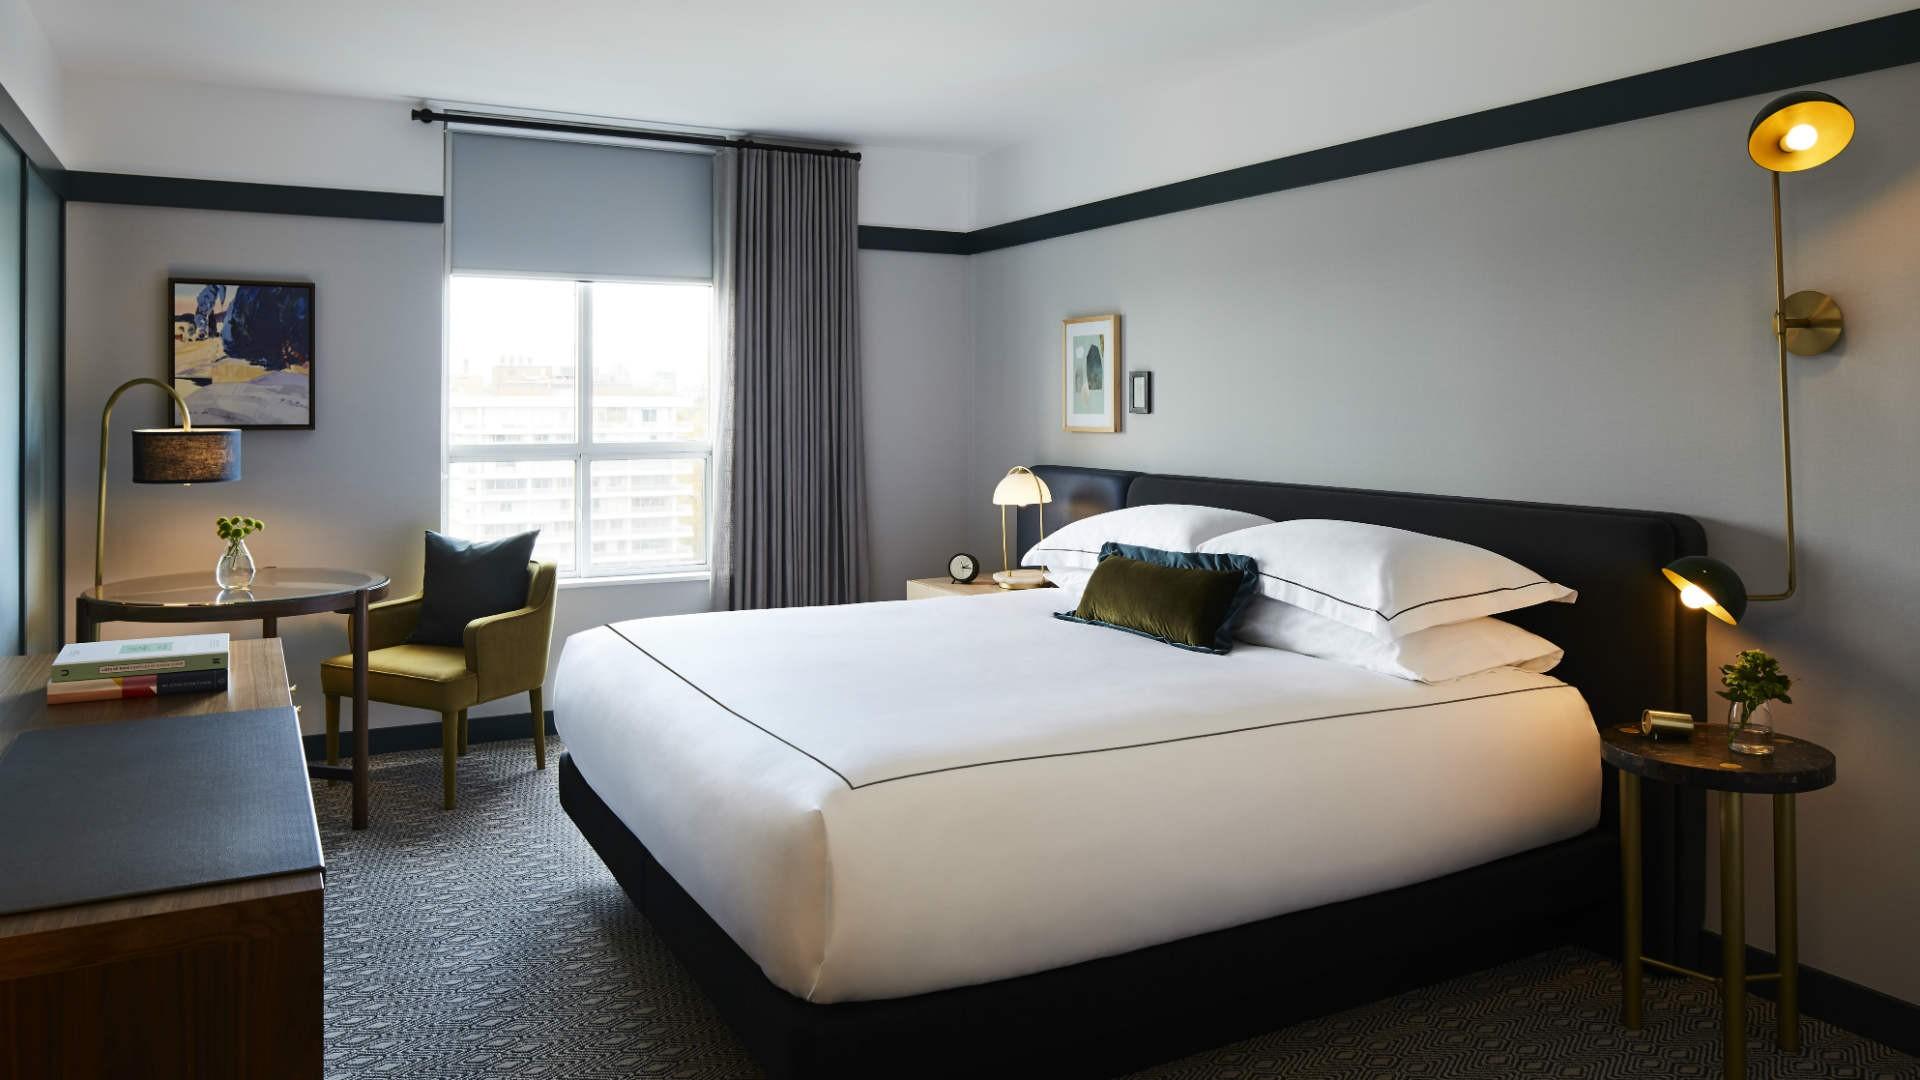 Hotel review: the Kimpton Saint George hotel, Toronto | Guestroom at Kimpton Saint George